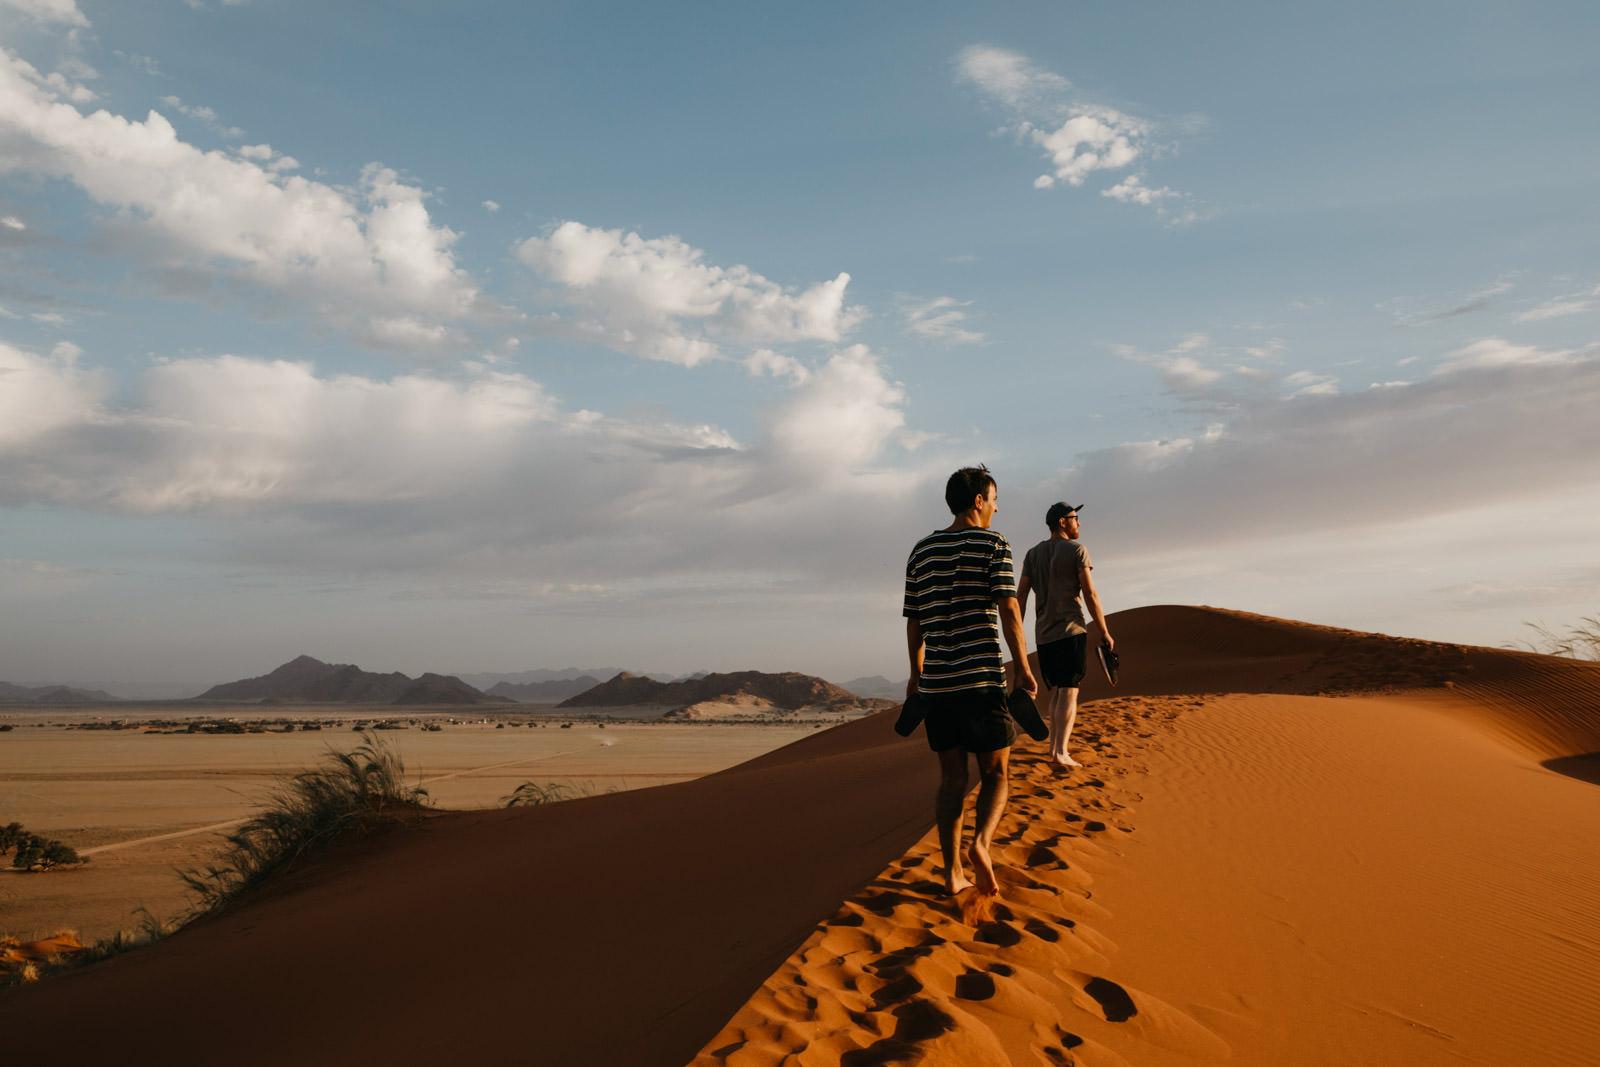 namibia_trip_rooftent_camping_roadtrip (23 von 26).jpg